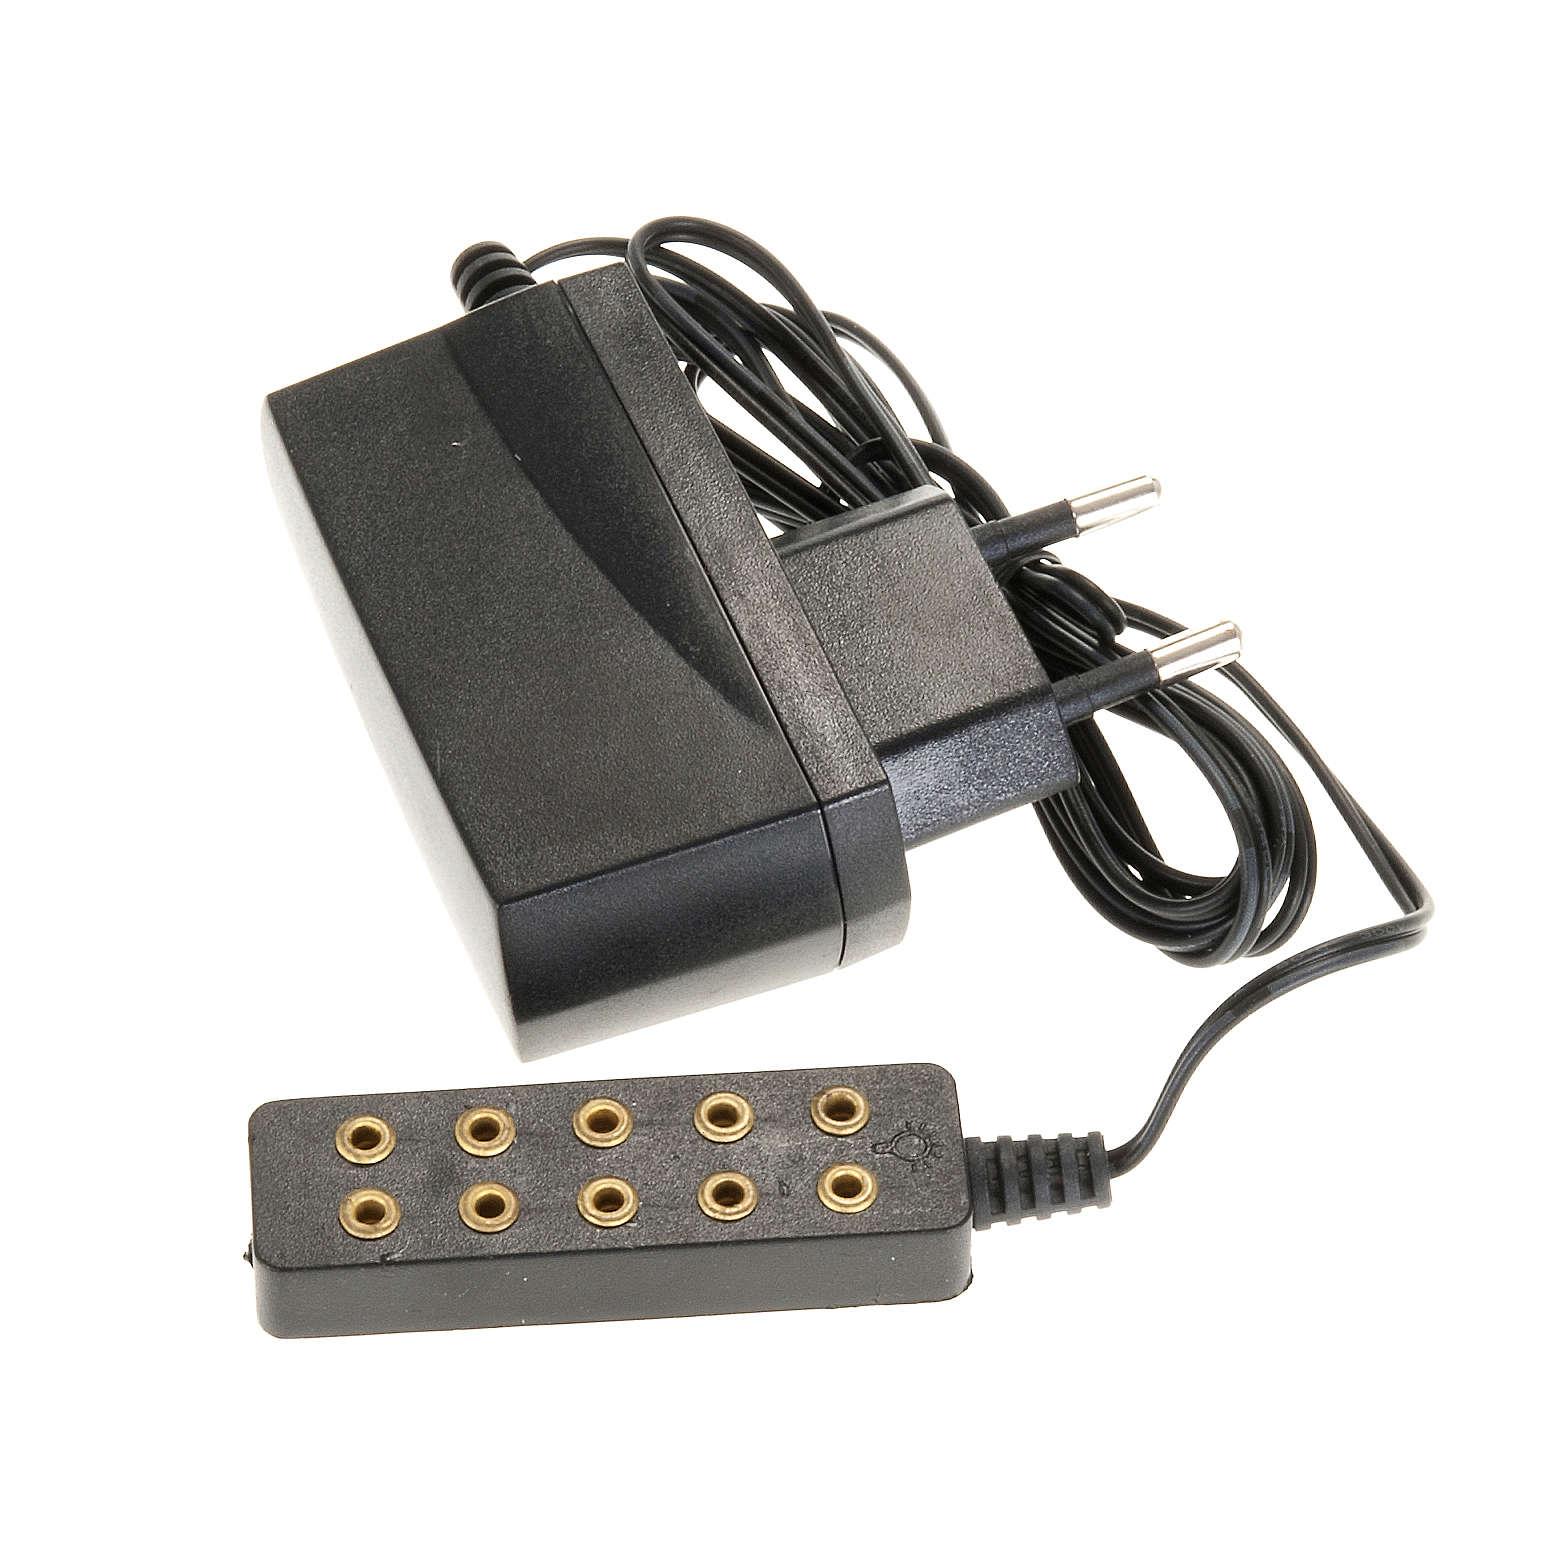 Nativity accessory, current processor, 5 sockets, static light 4